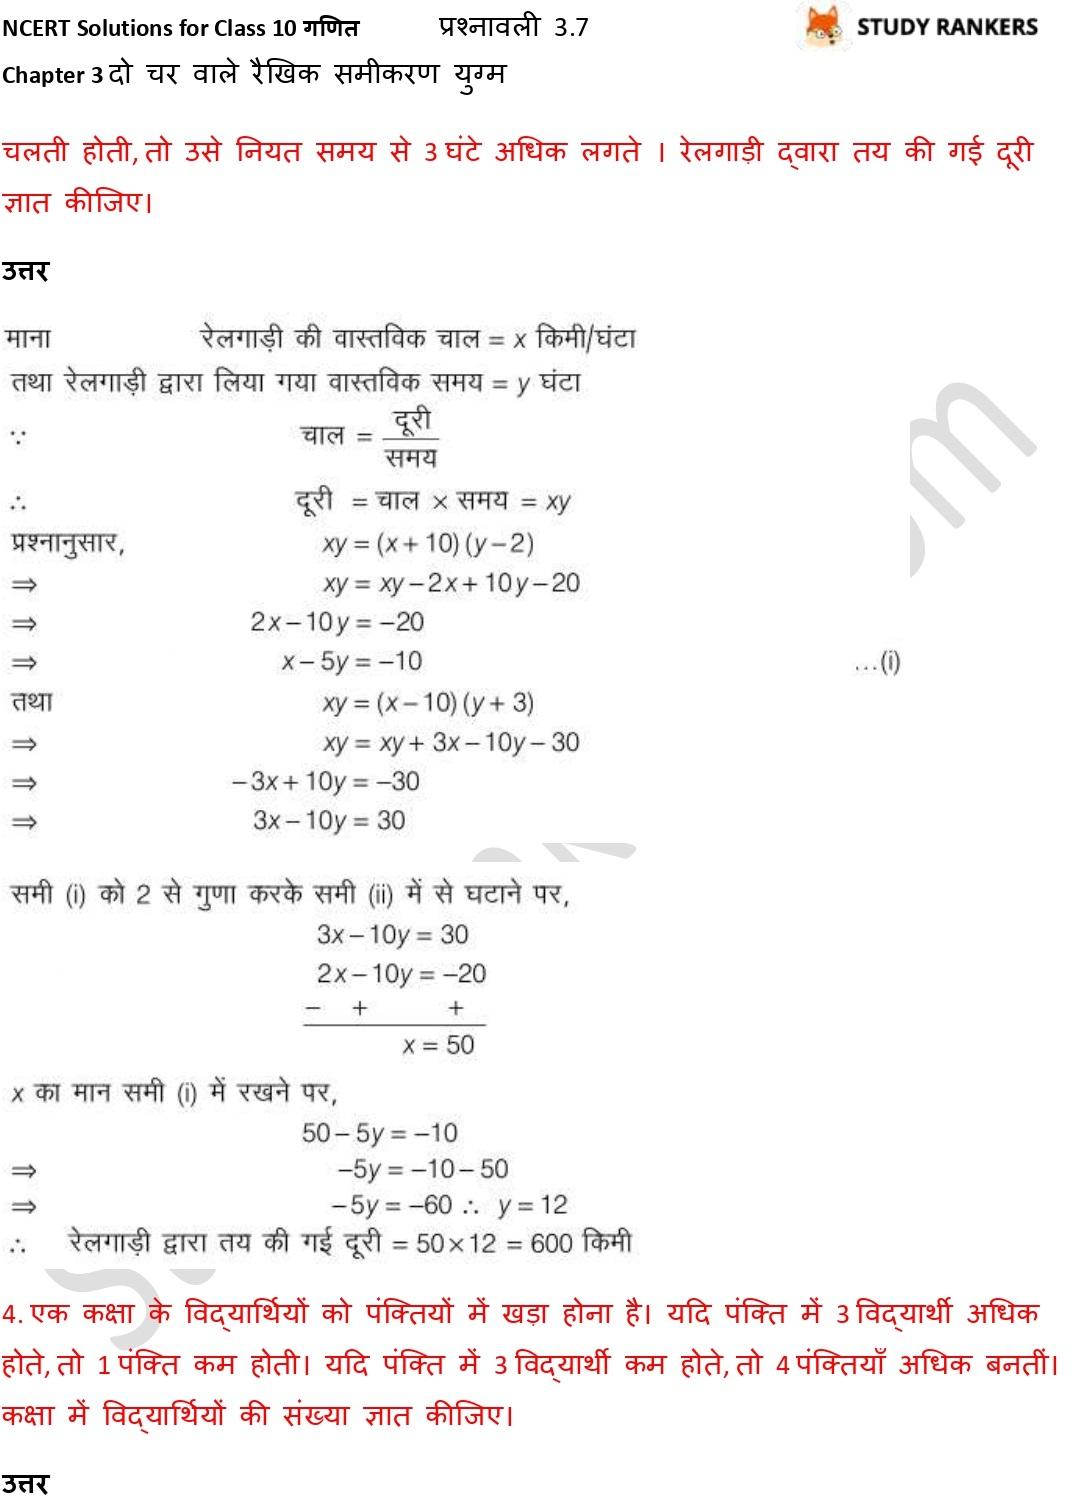 NCERT Solutions for Class 10 Maths Chapter 3 दो चर वाले रैखिक समीकरण युग्म प्रश्नावली 3.7 Part 3